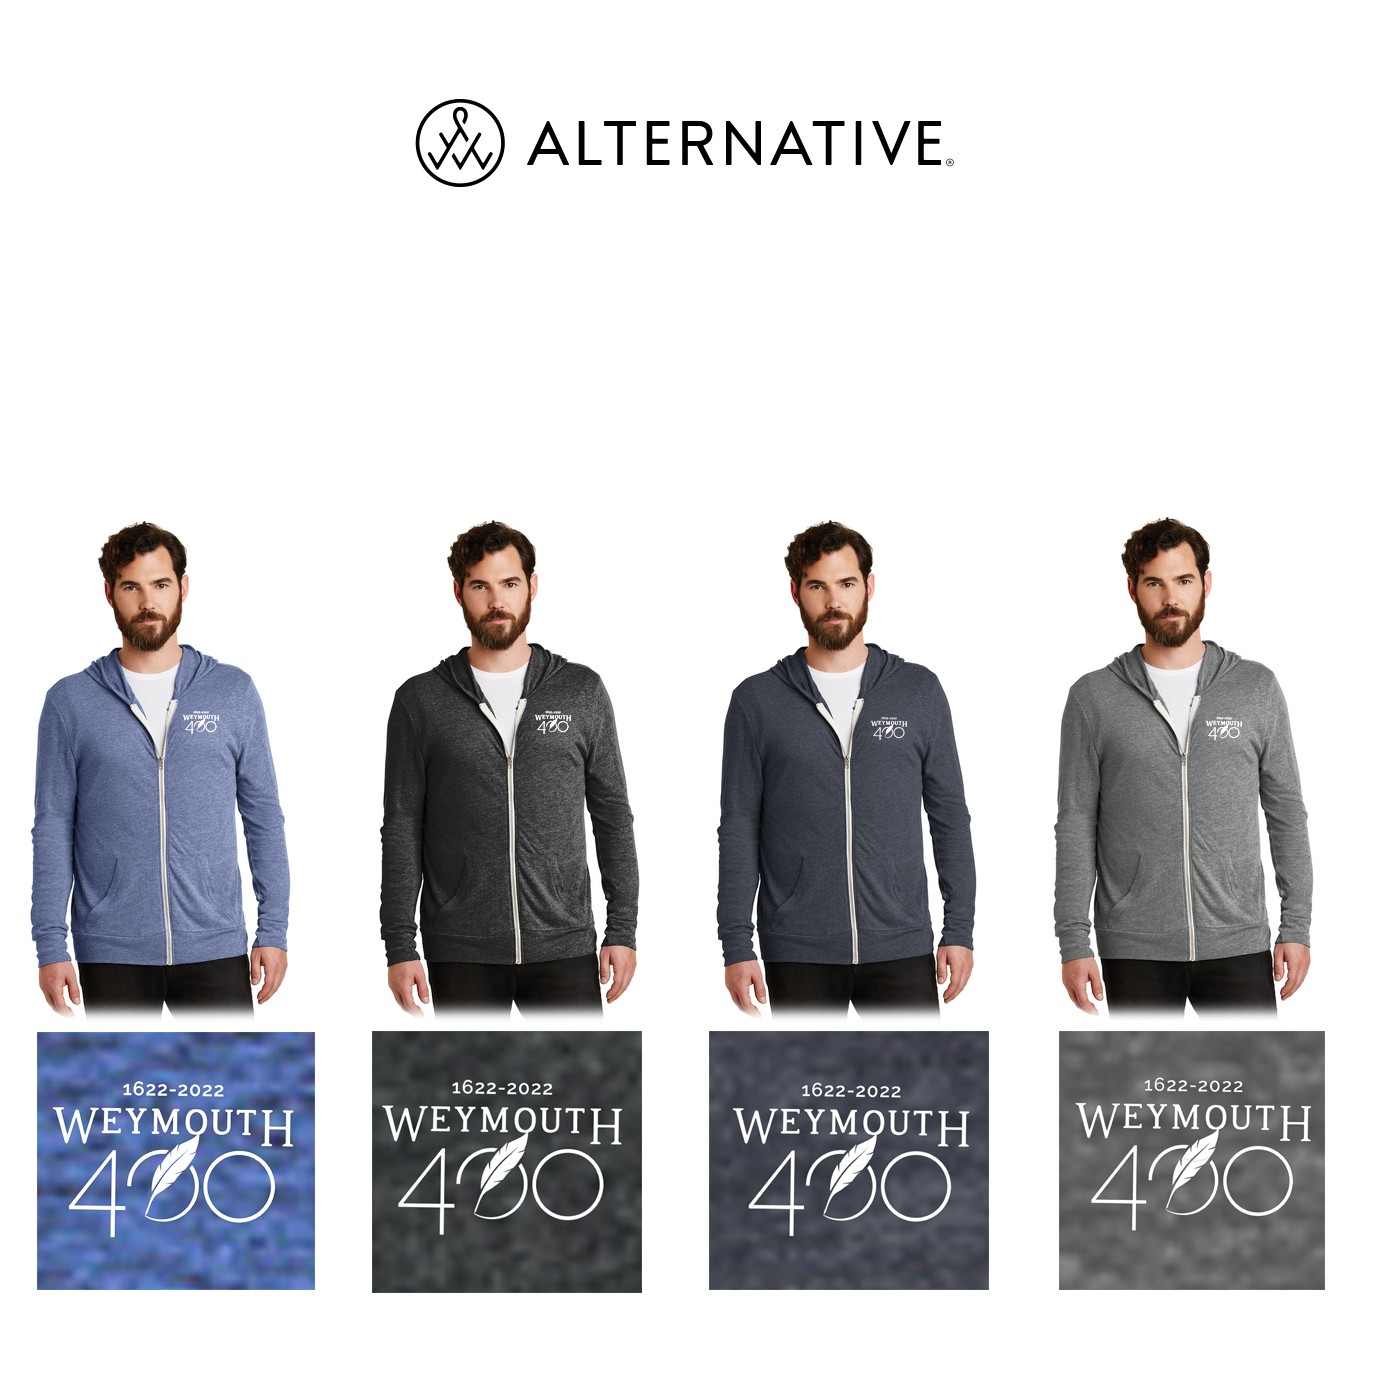 Weymouth 400 Alternative® Eco-Jersey Zip Hoodie